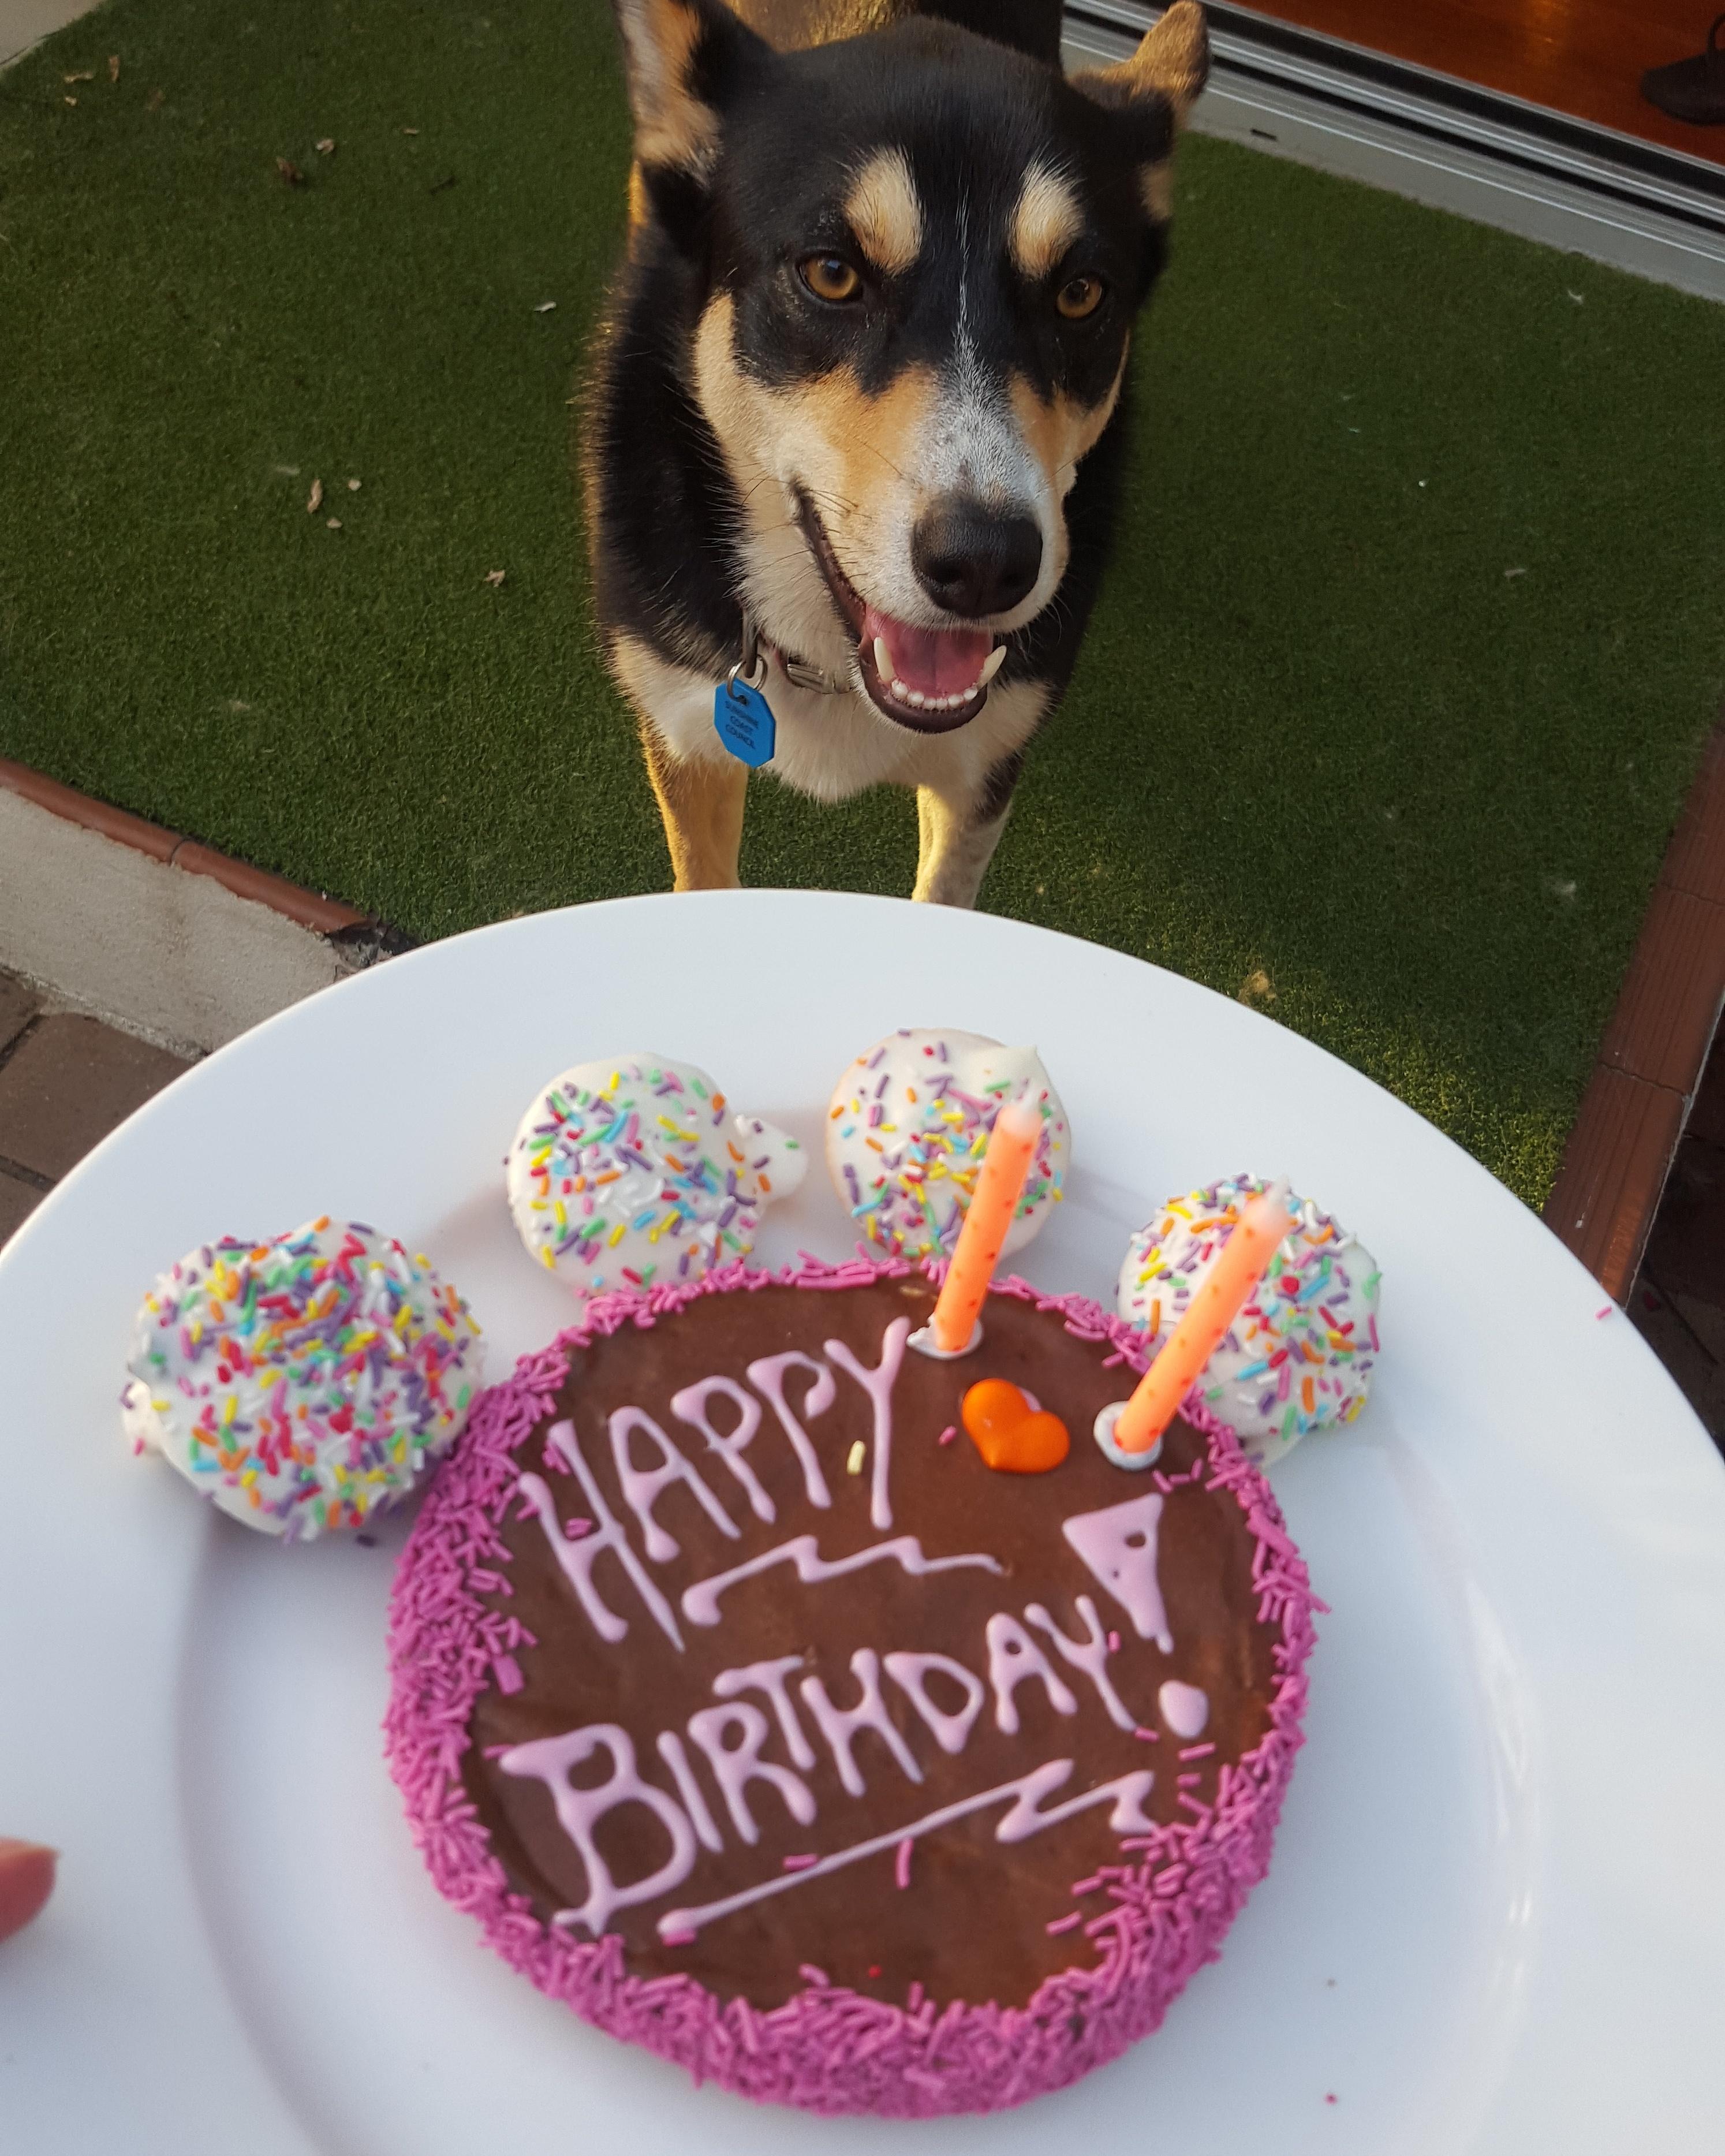 CAROB DOGGY BIRTHDAY CAKE DOG TREAT